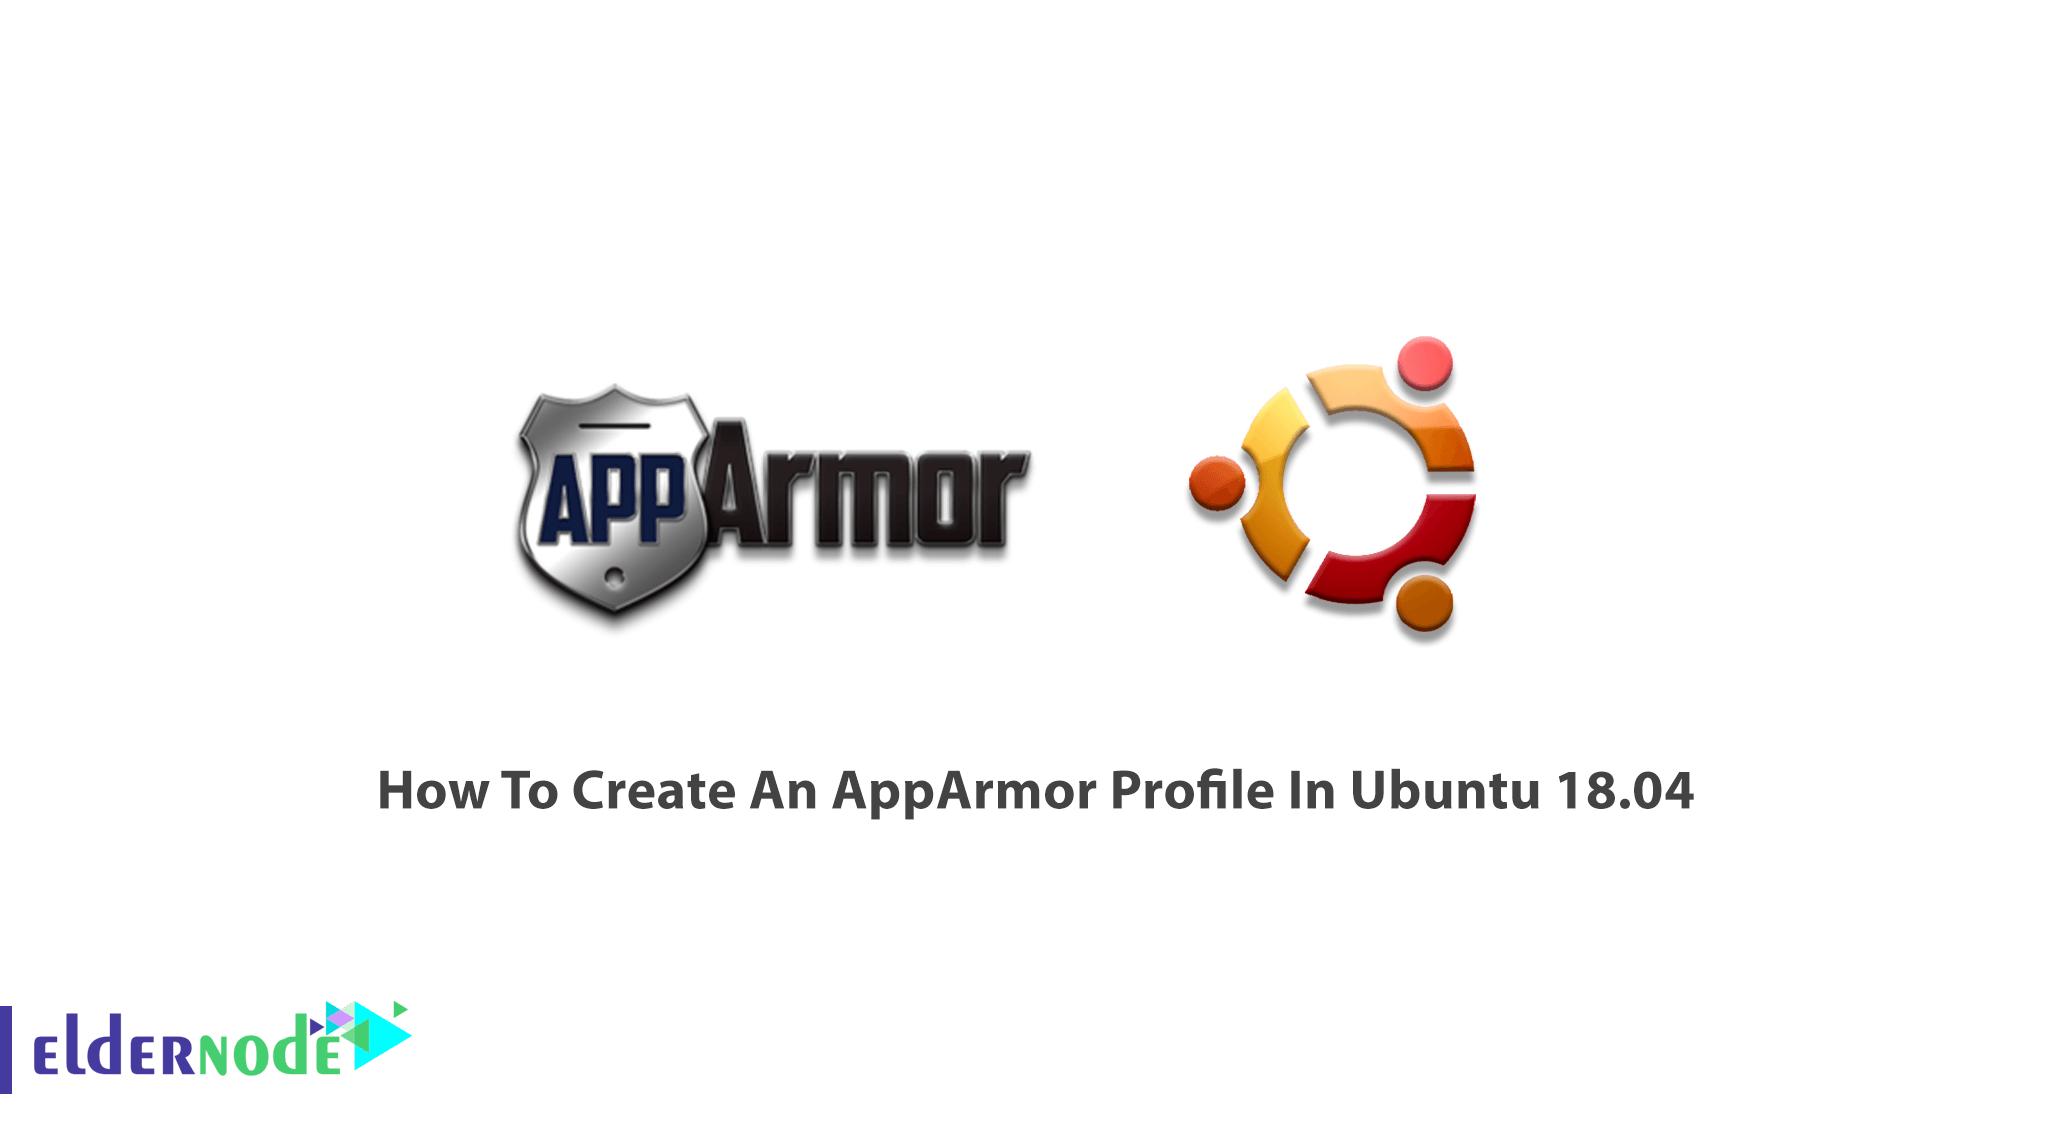 How To Create An AppArmor Profile In Ubuntu 18.04